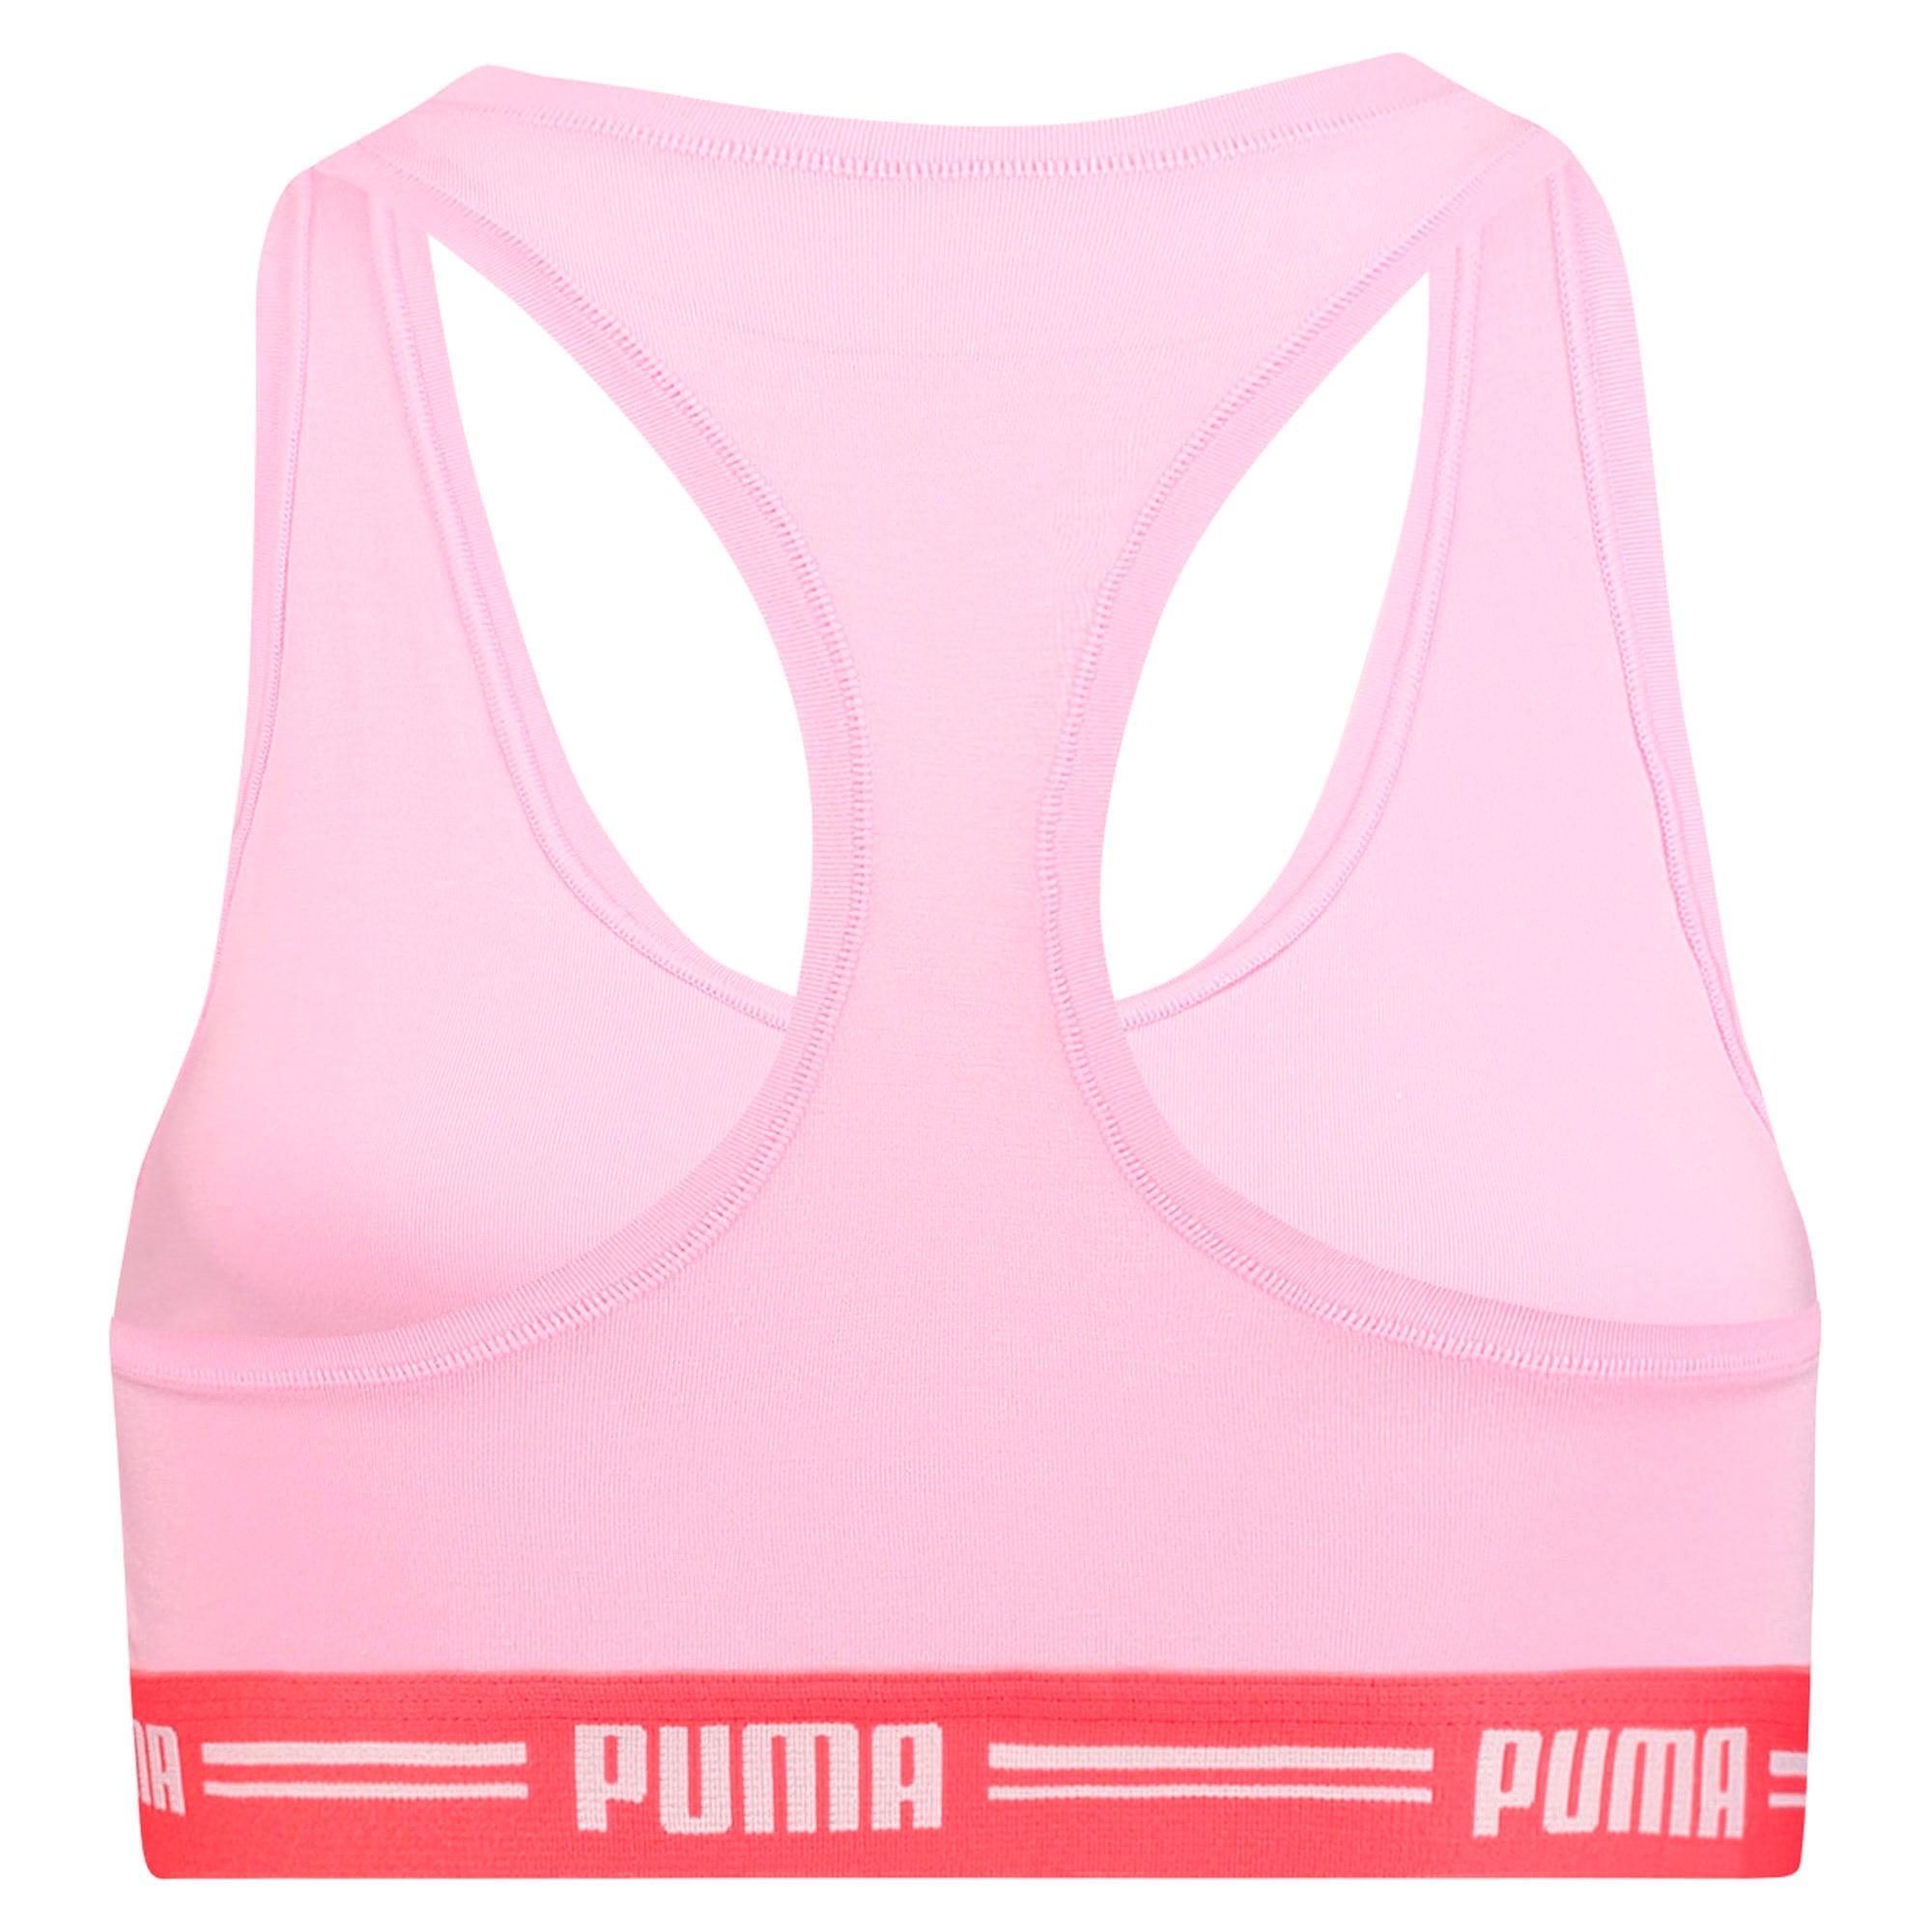 Thumbnail 4 of Iconic Racerback Women's Bra, pink / red, medium